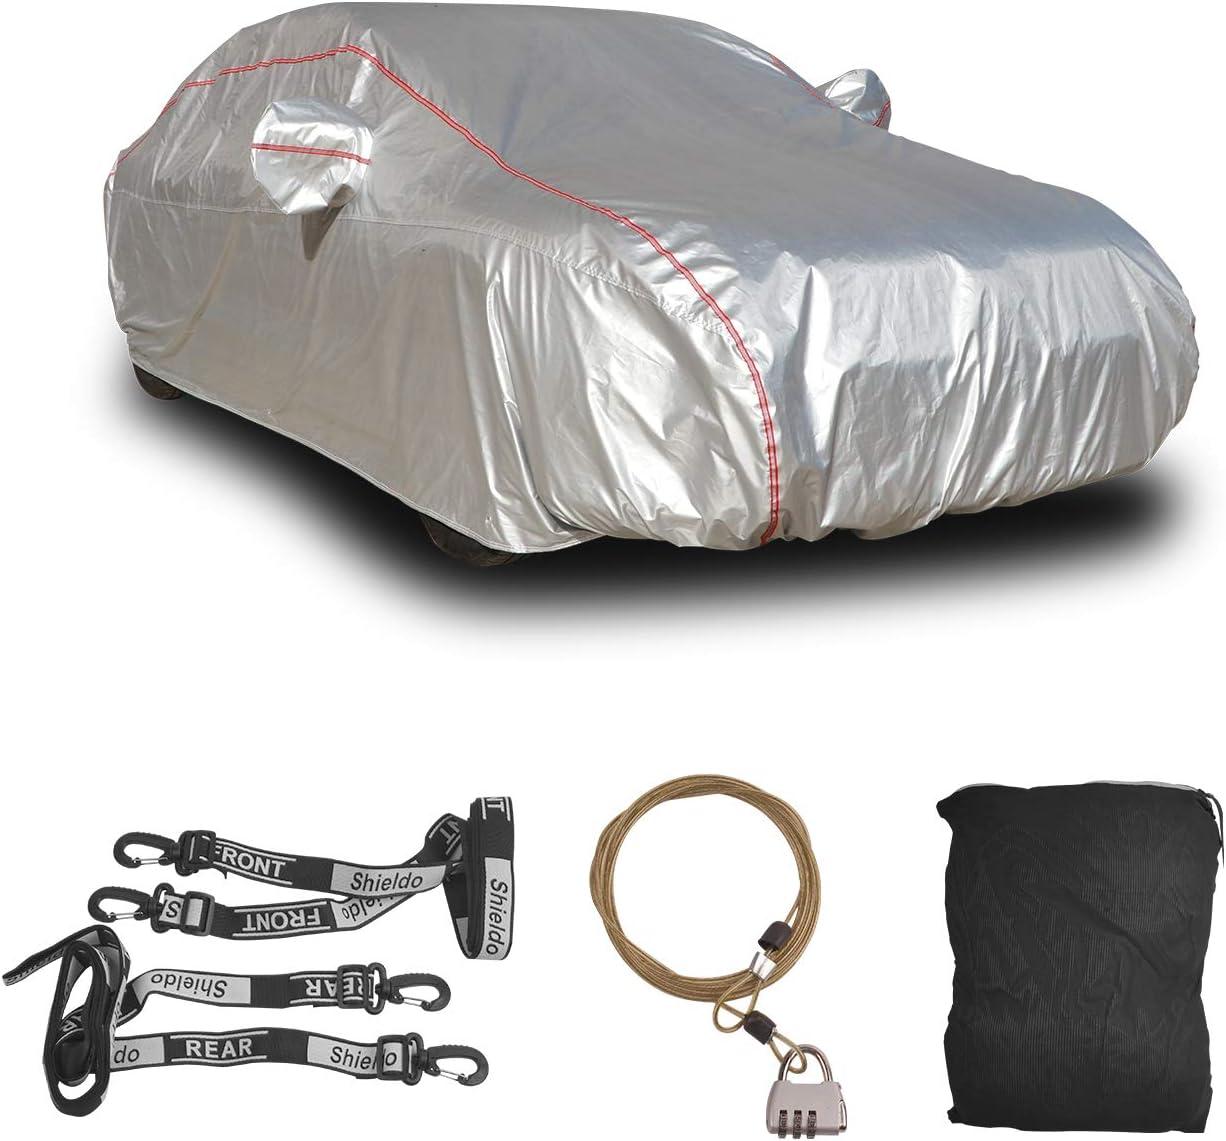 Shieldo Deluxe Car Cover with Build-in Storage Bag Door Zipper Windproof Straps and Buckles 100/% Waterproof All Season Weather-Proof Fit 191-200 Length Sedan